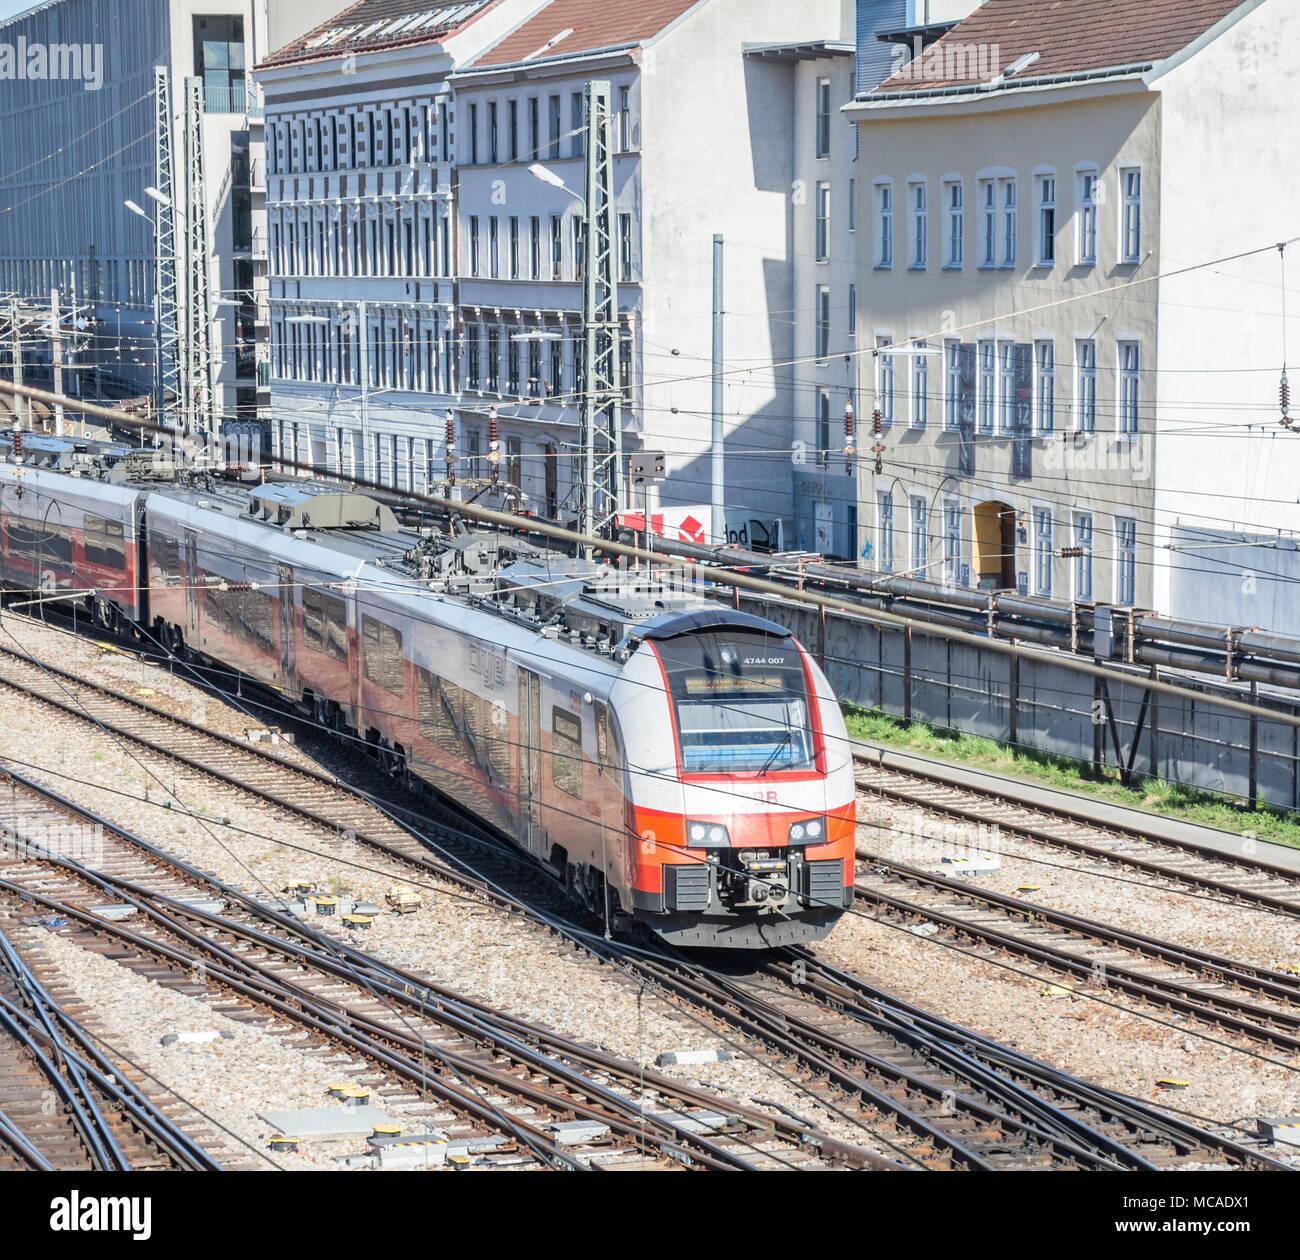 Austrian Federal Railways OBB city jet from above, Vienna Austria, April 14, 2018 - Stock Image